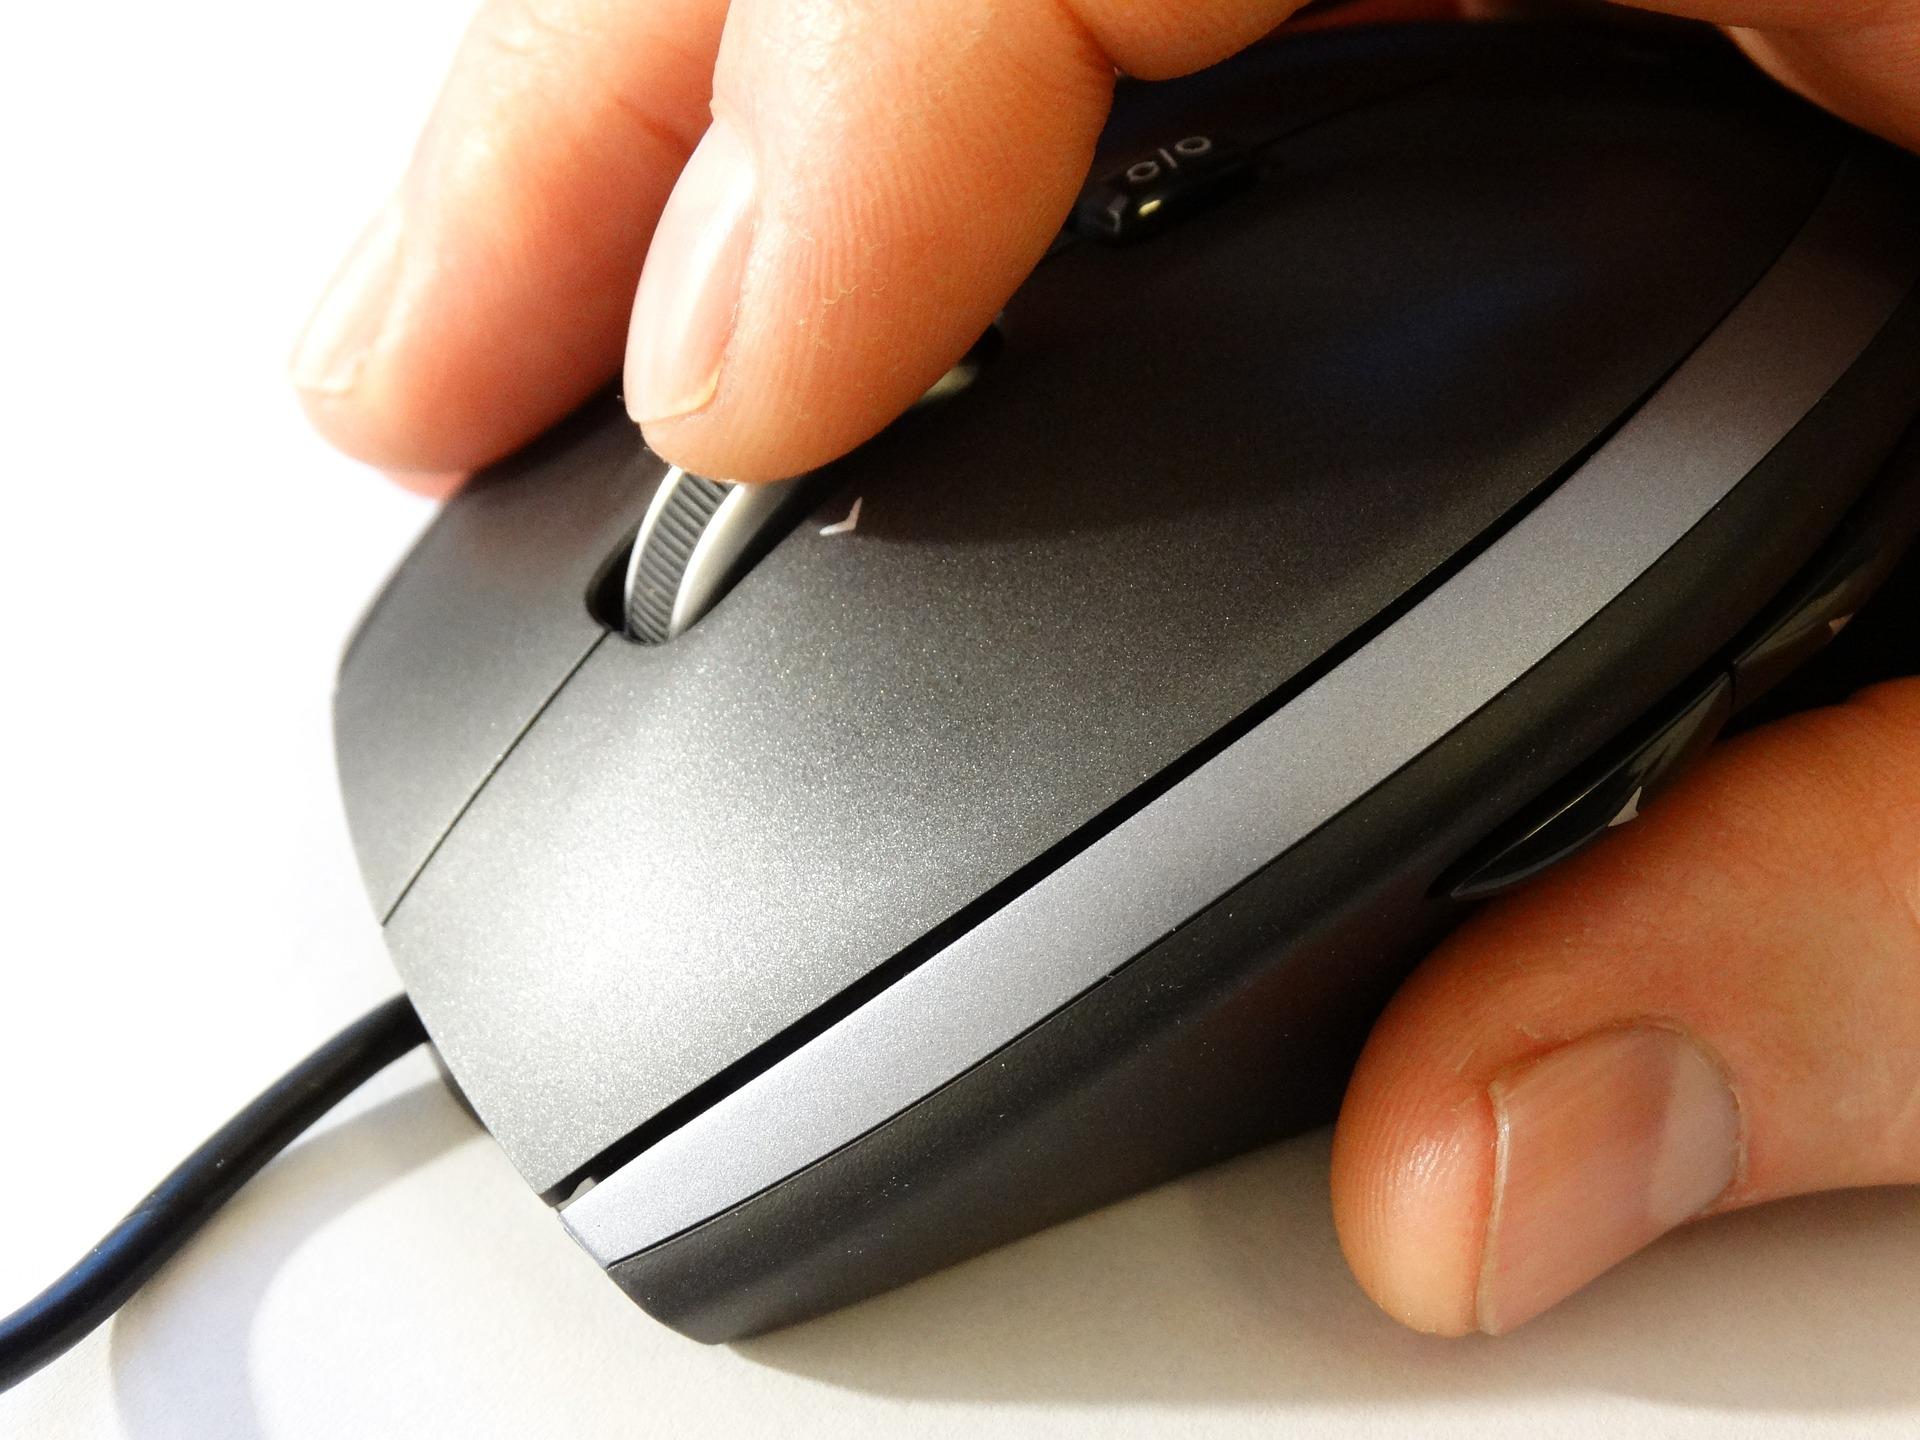 pc-mouse-625151_1920